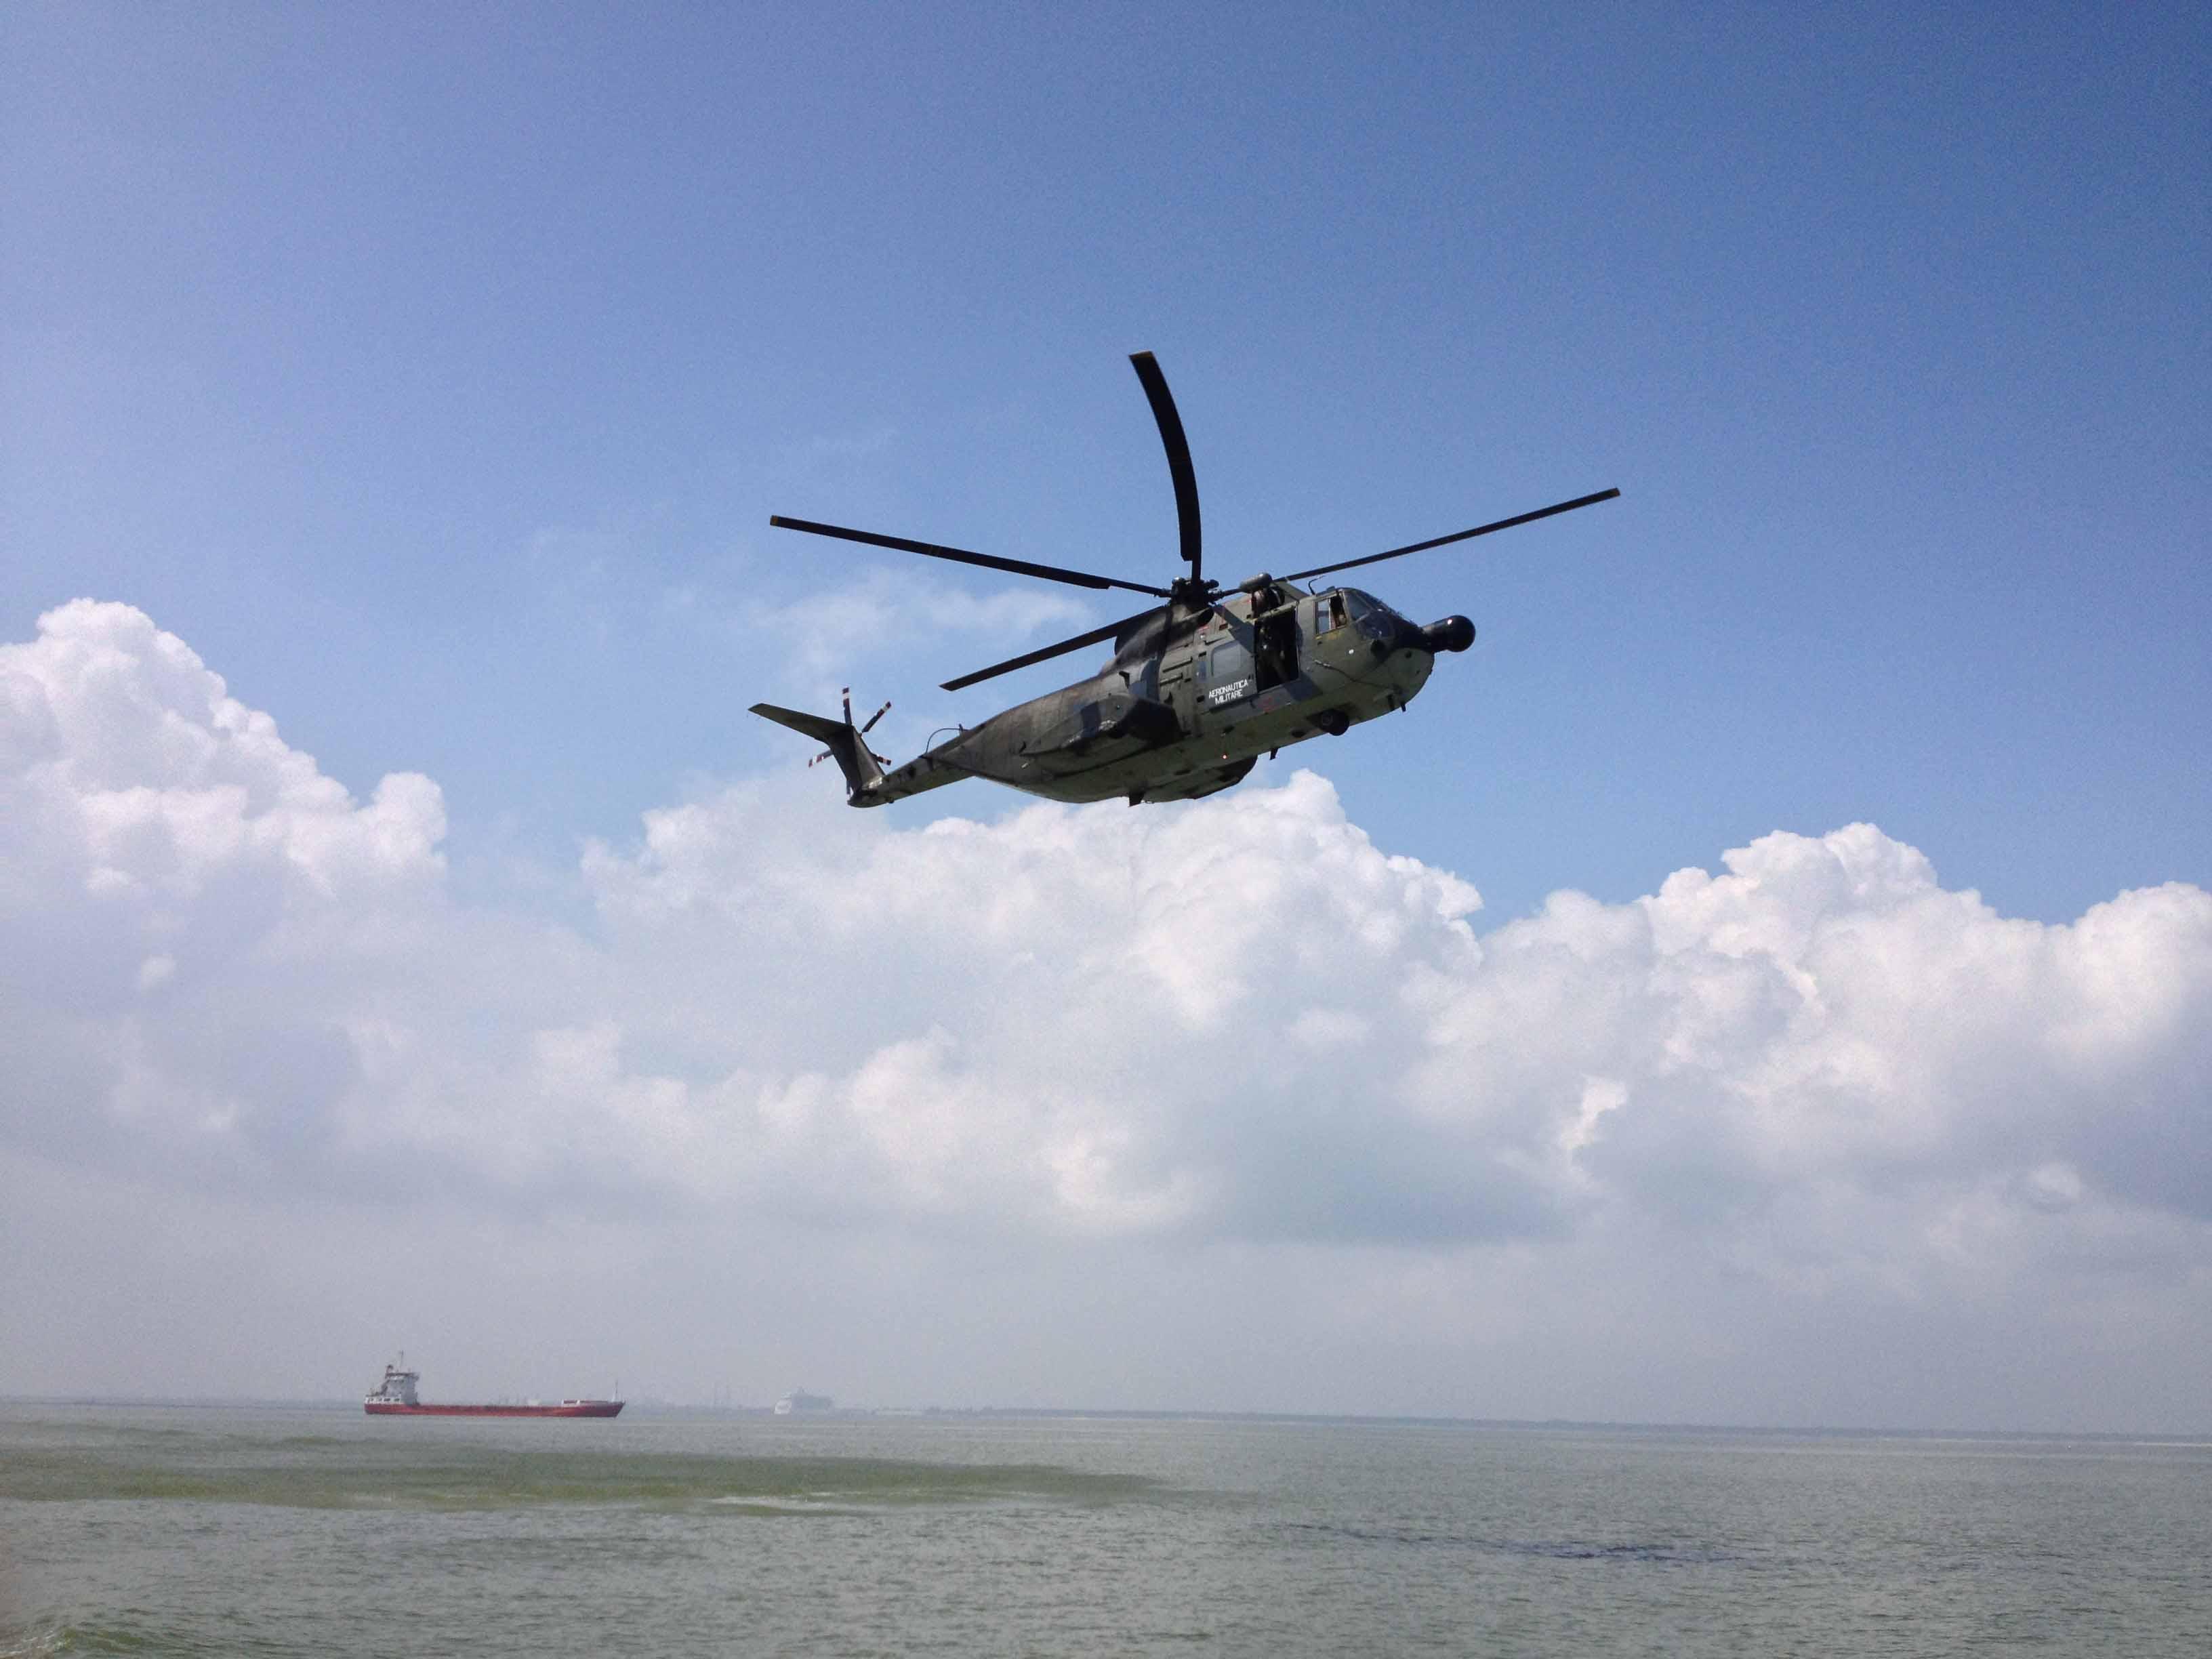 Évacuation médicale d'un marin blessé